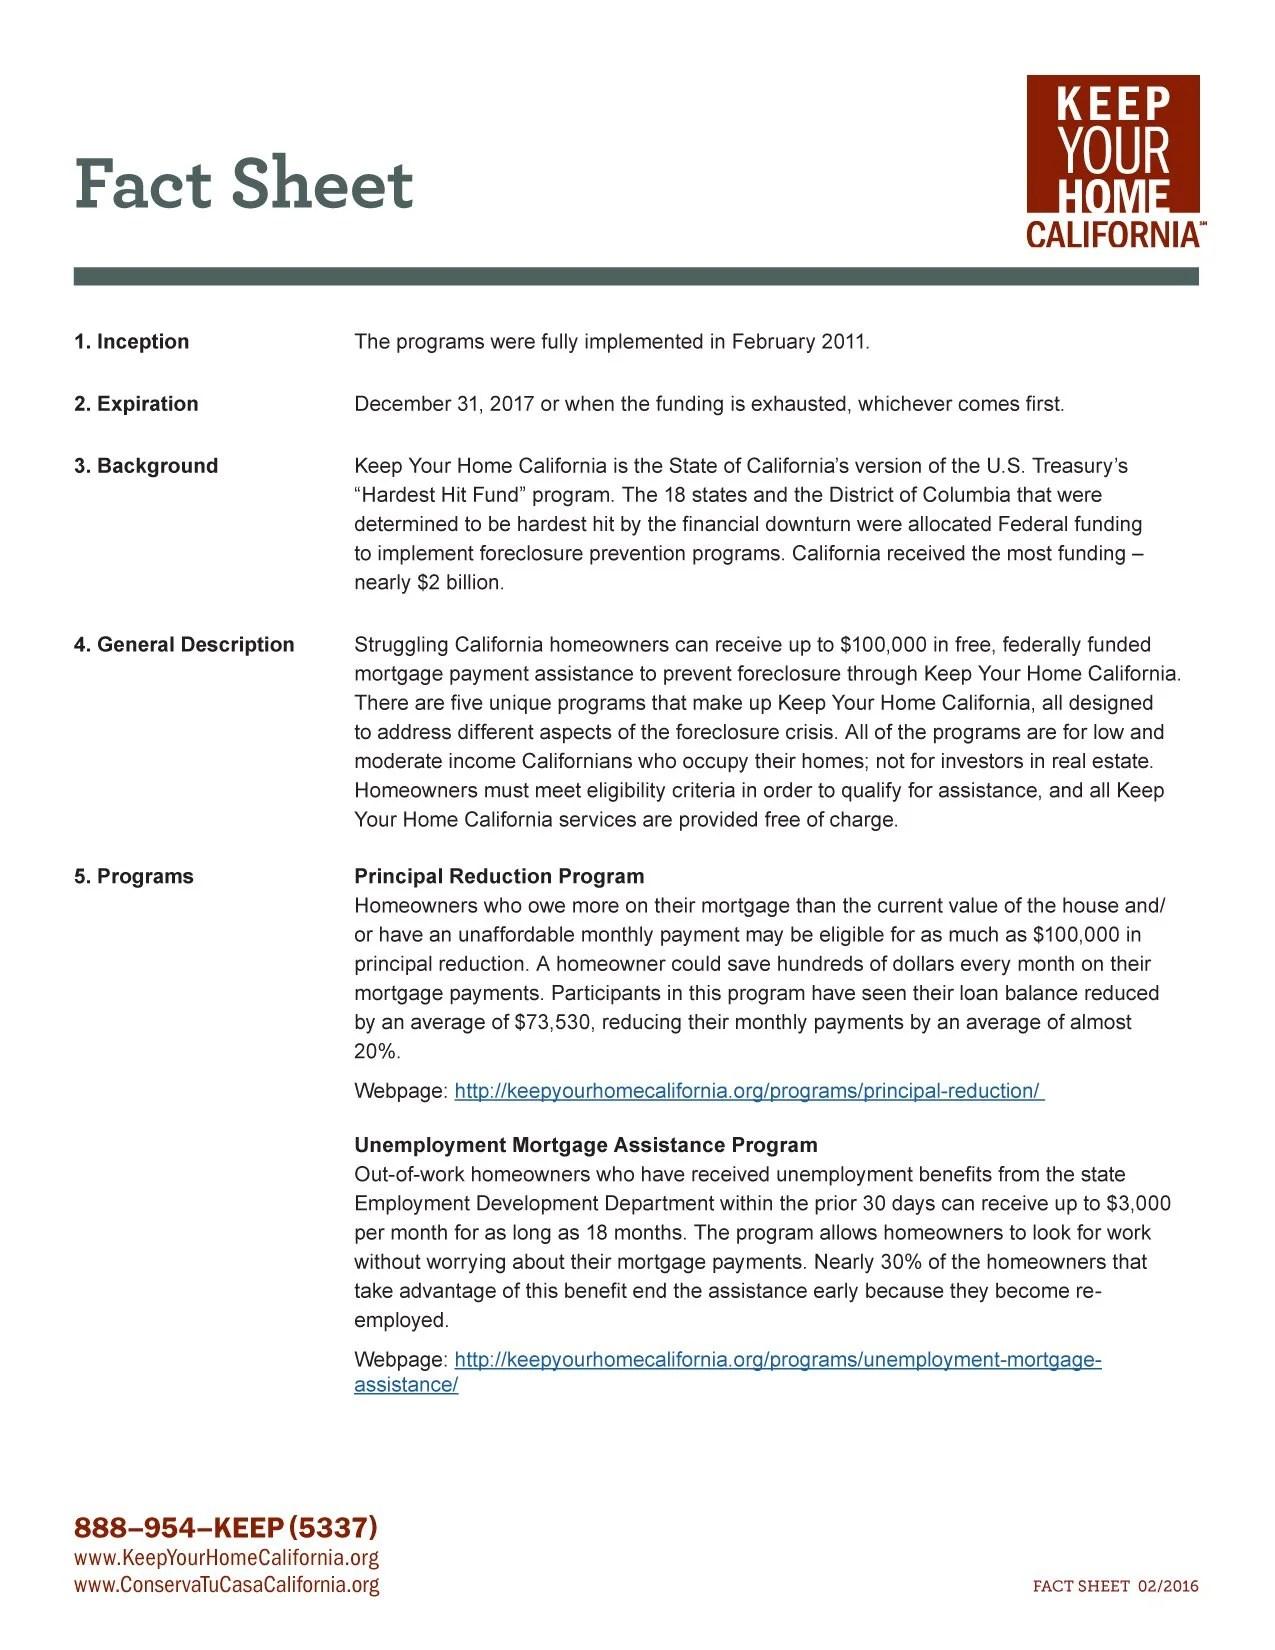 Fact-Sheet-1